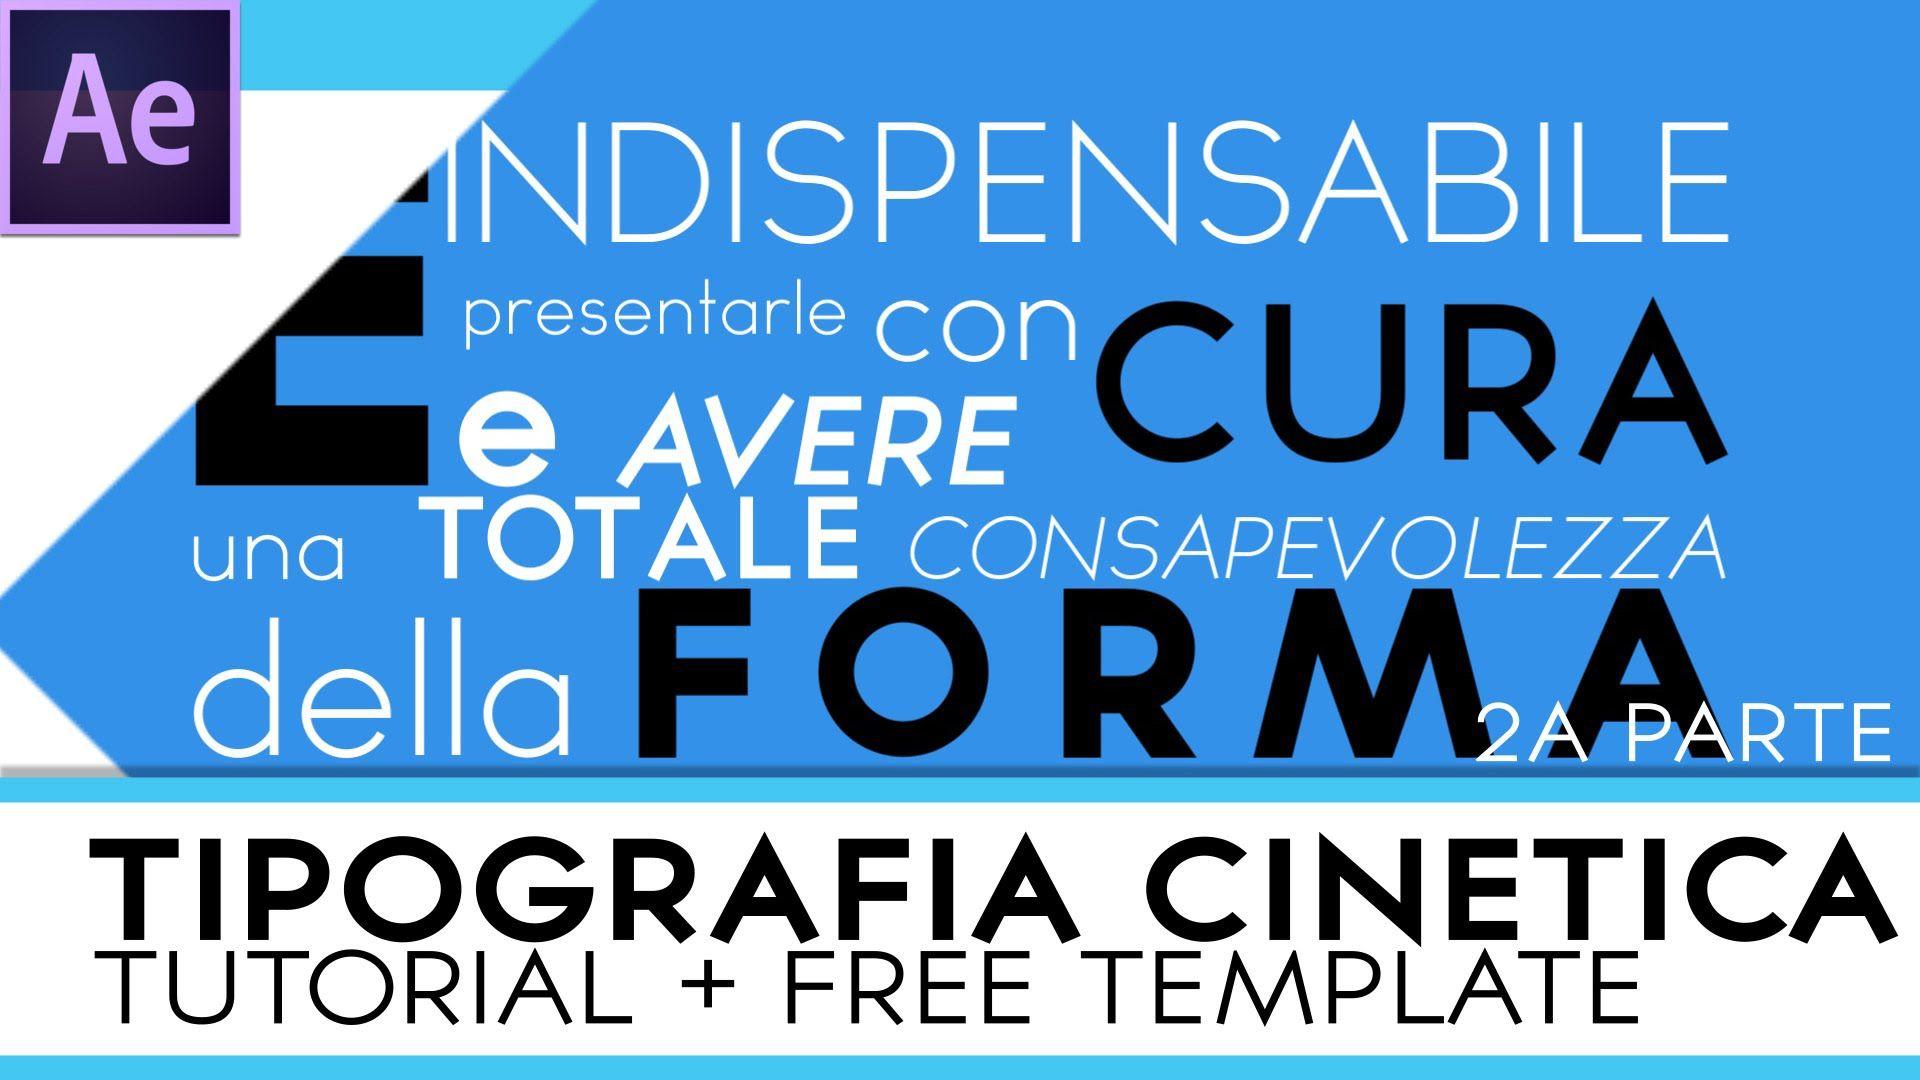 Tutorial Tipografia Cinetica - parte 2 | Tutorials | Pinterest ...